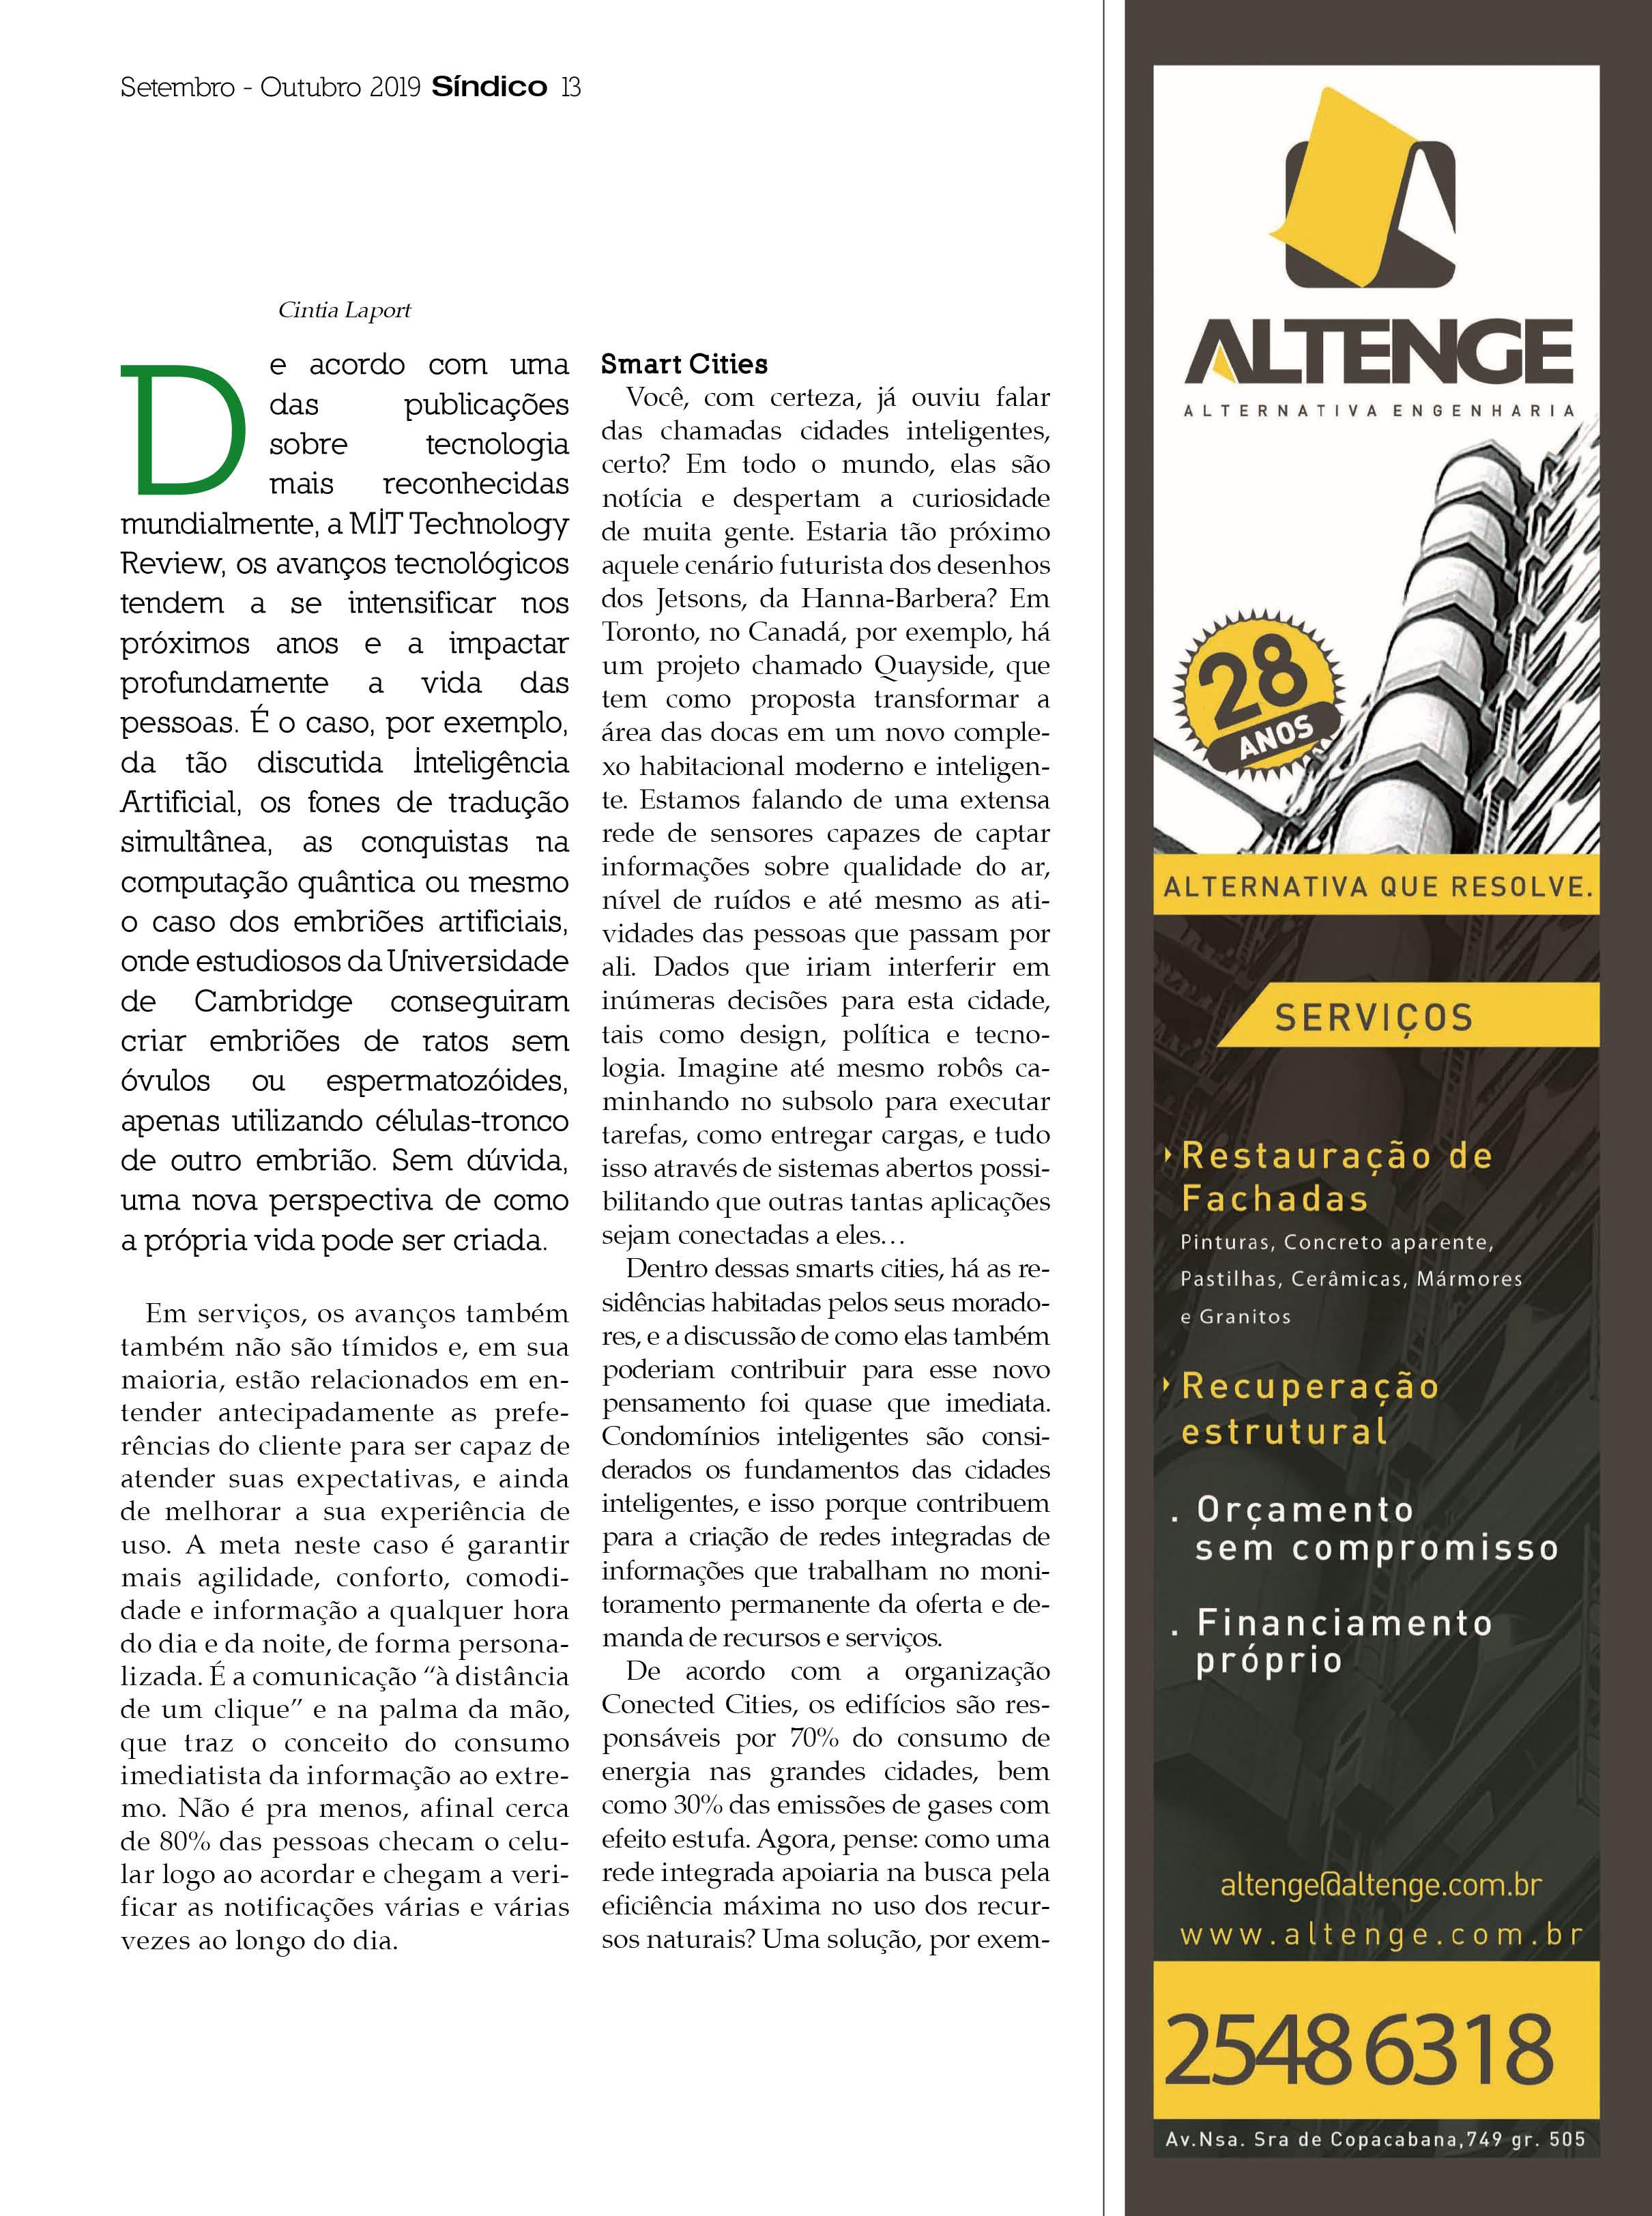 Revista Síndico_ed 246_11